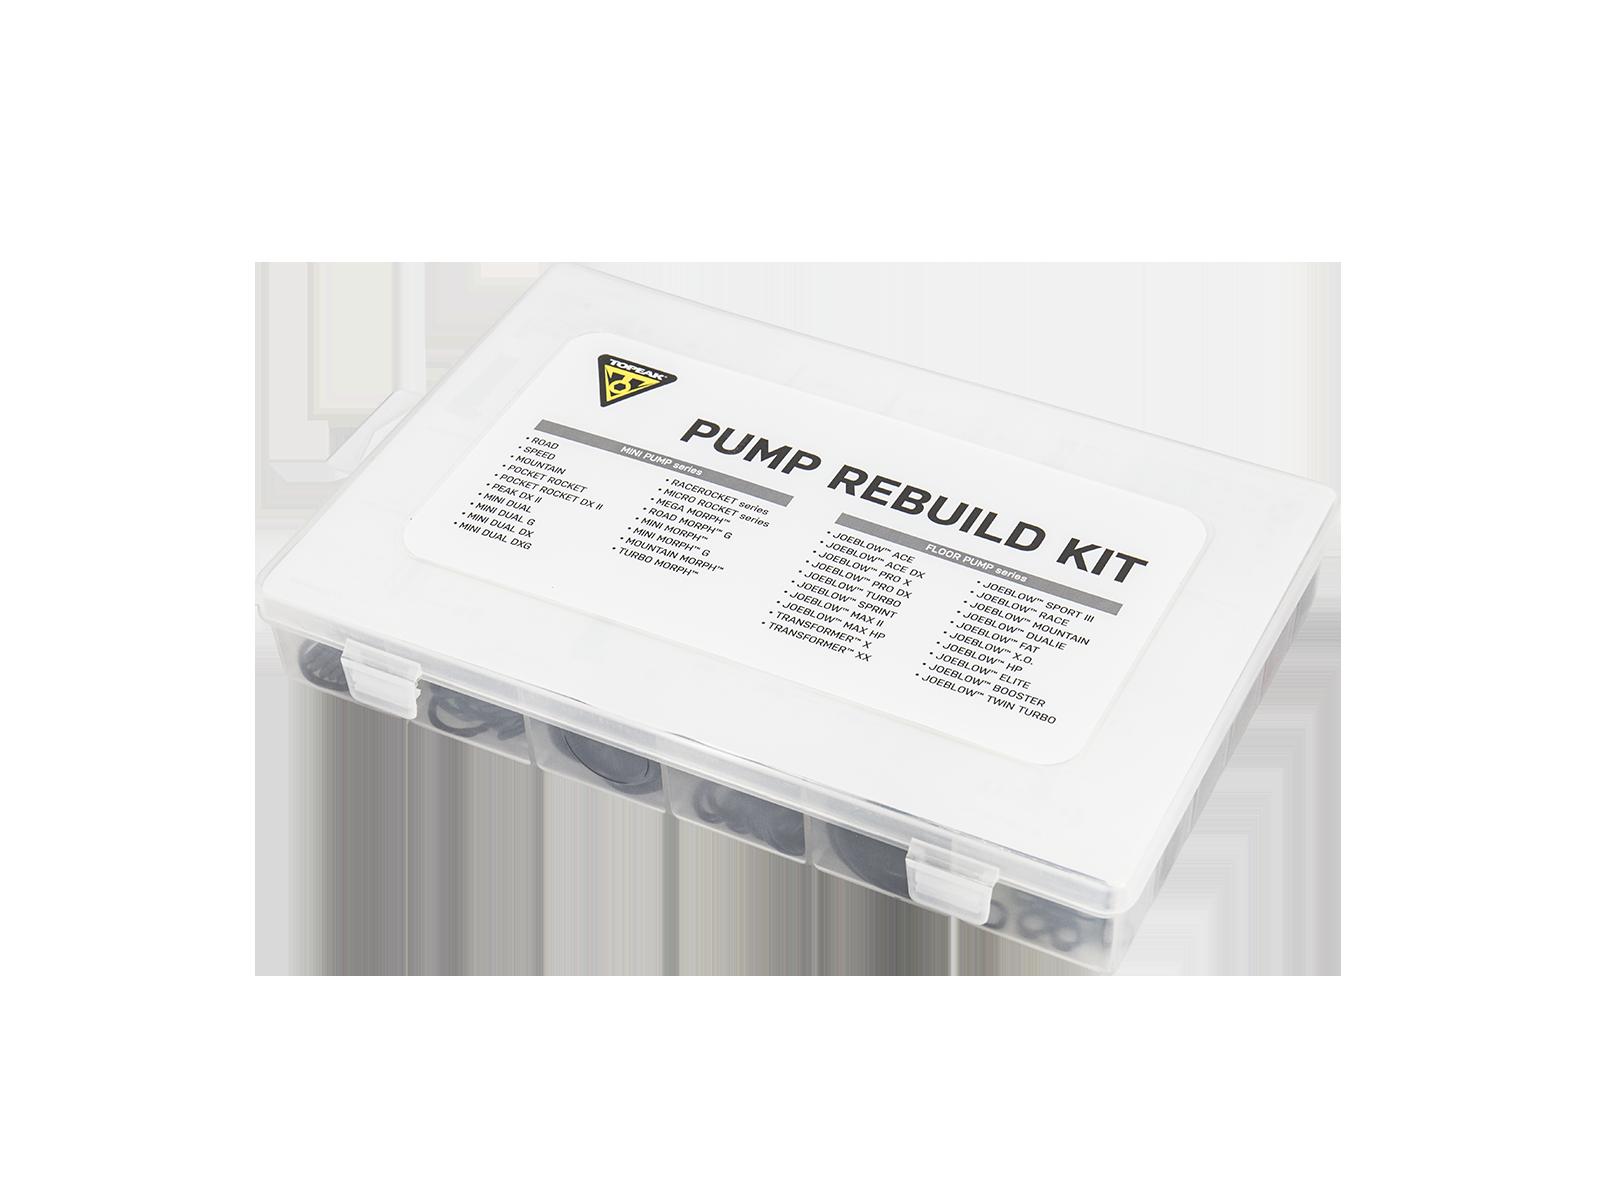 PUMP REBUILD KIT BOX | Topeak